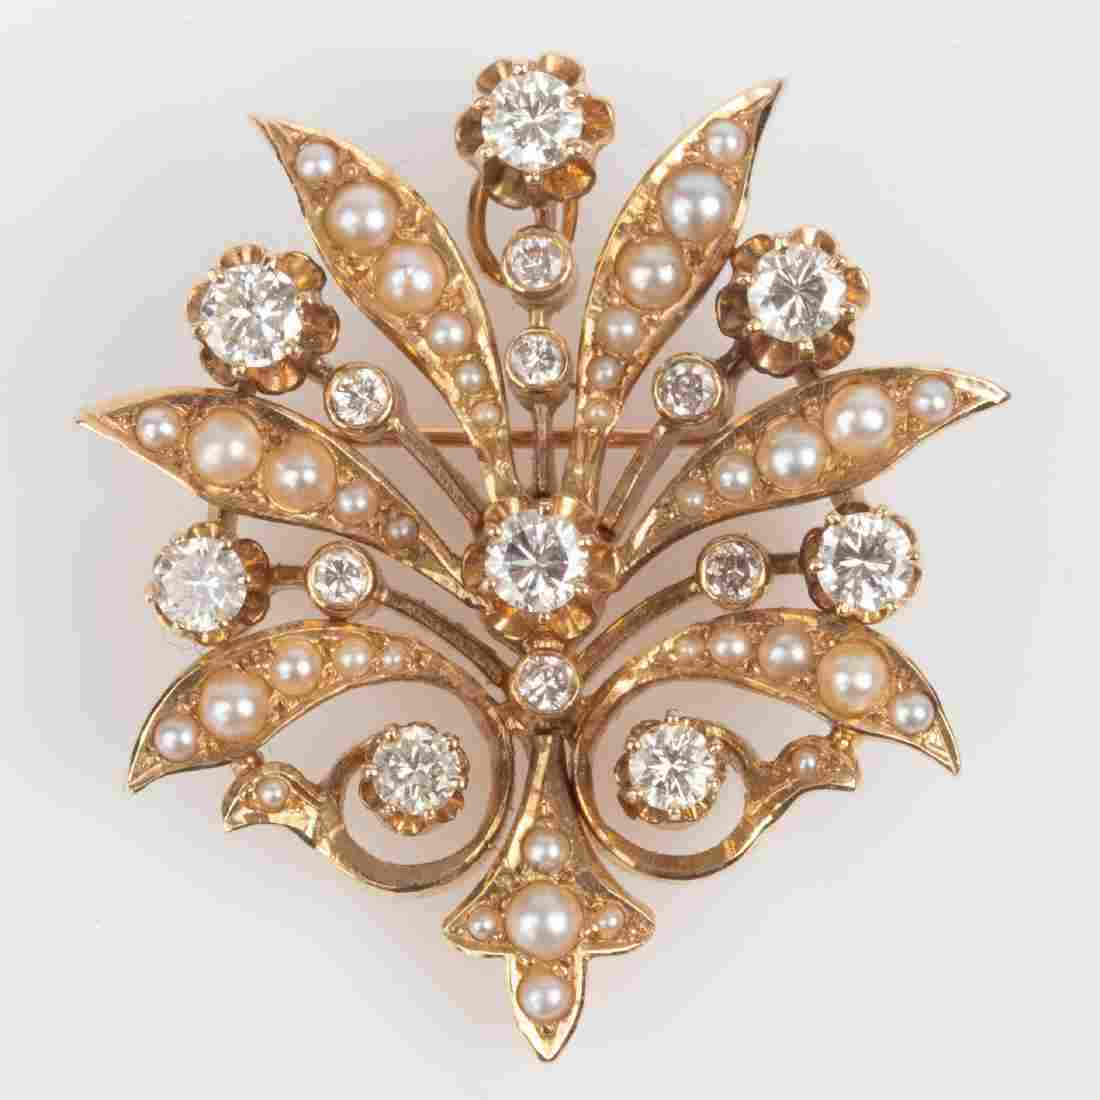 K. Goldschmidt 1.5ctw Diamond & Seed Pearl Brooch /